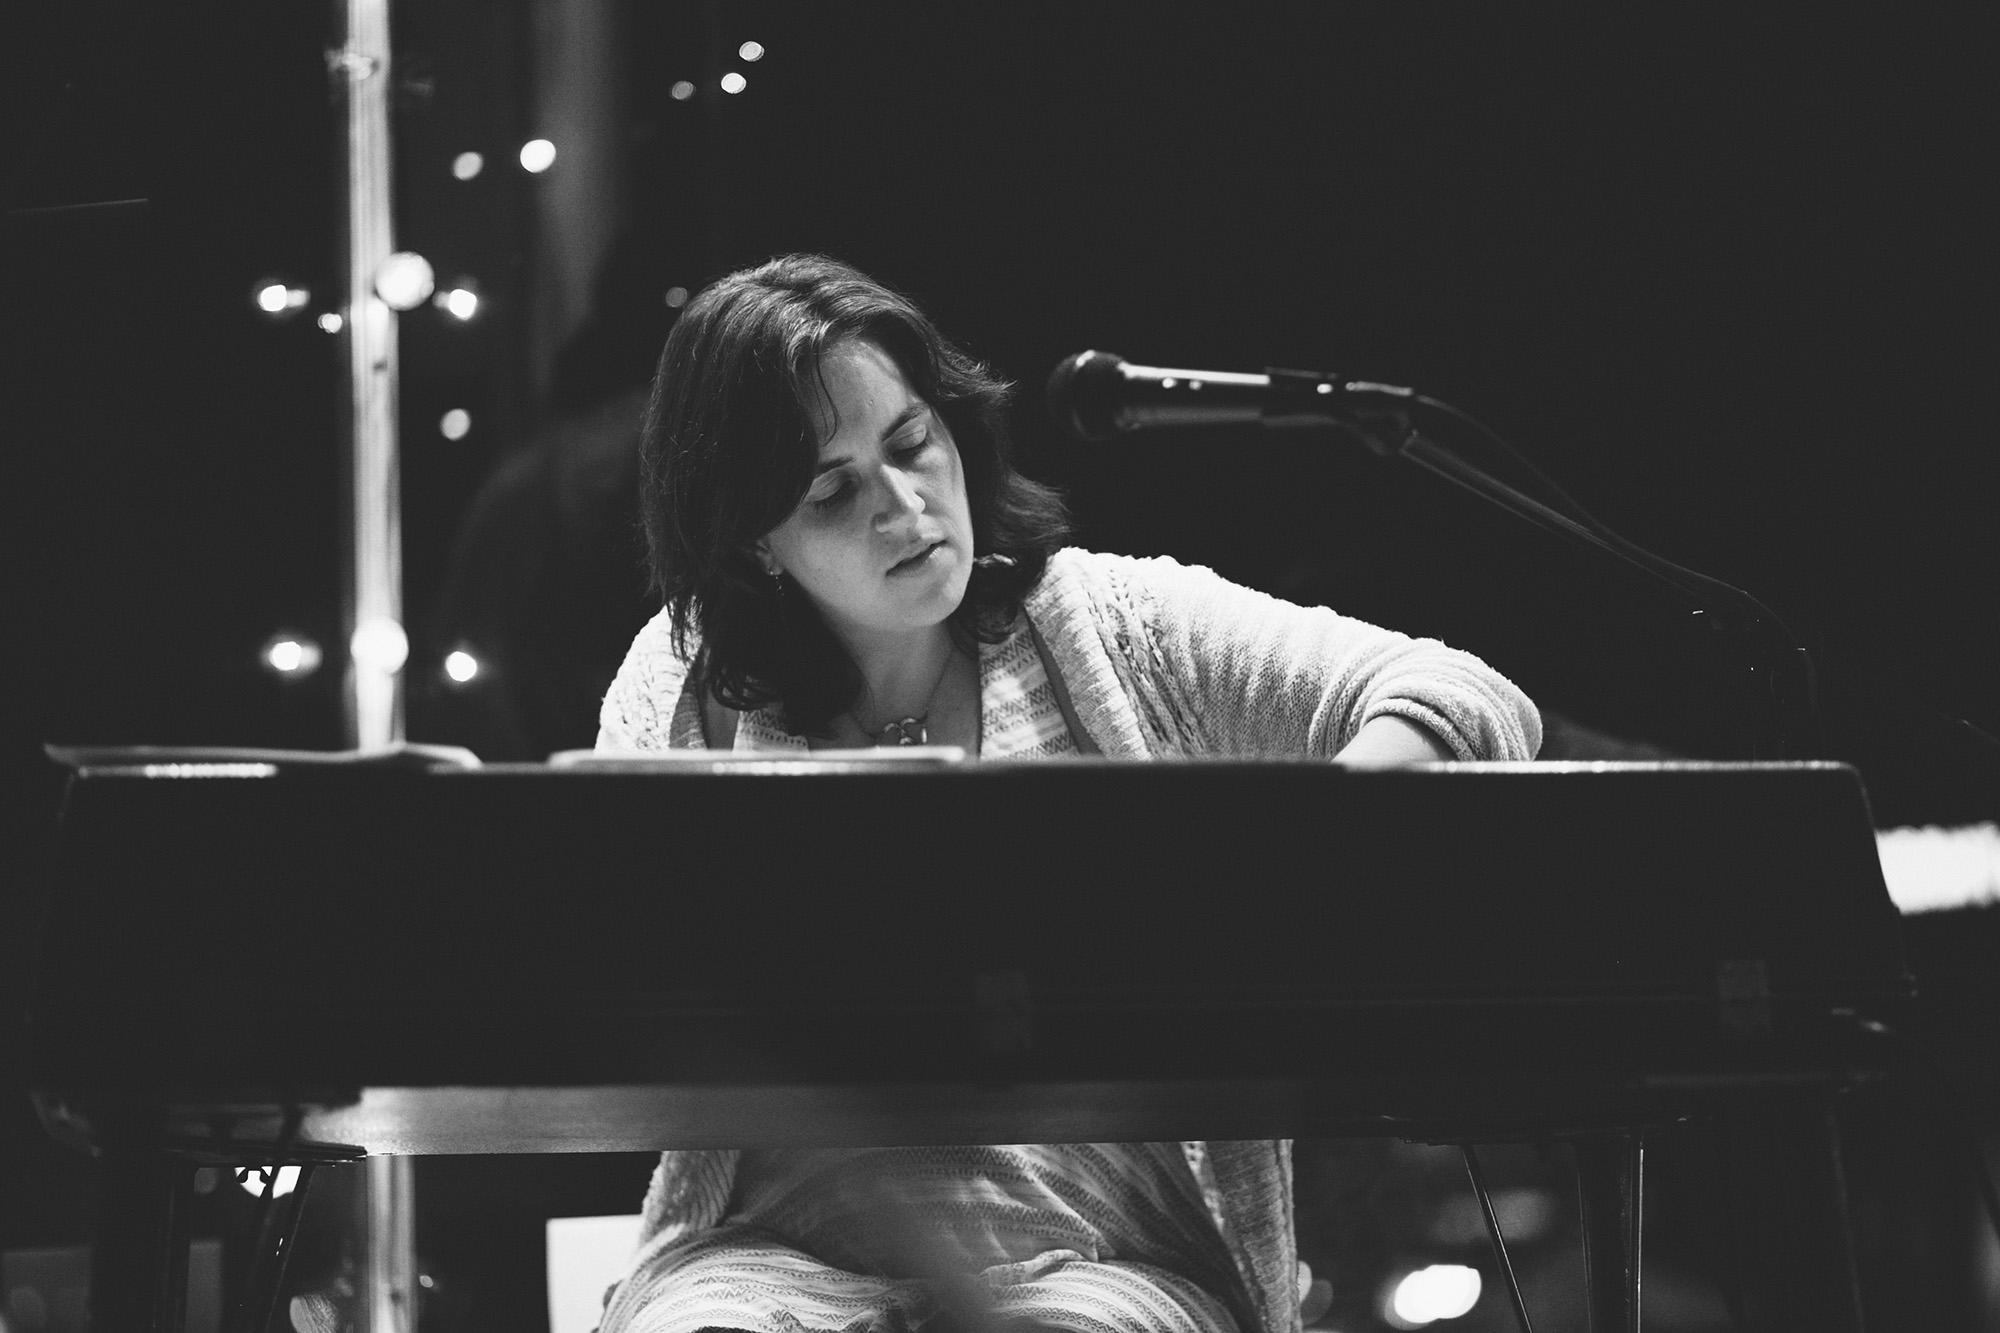 Amy playing a wurlitzer